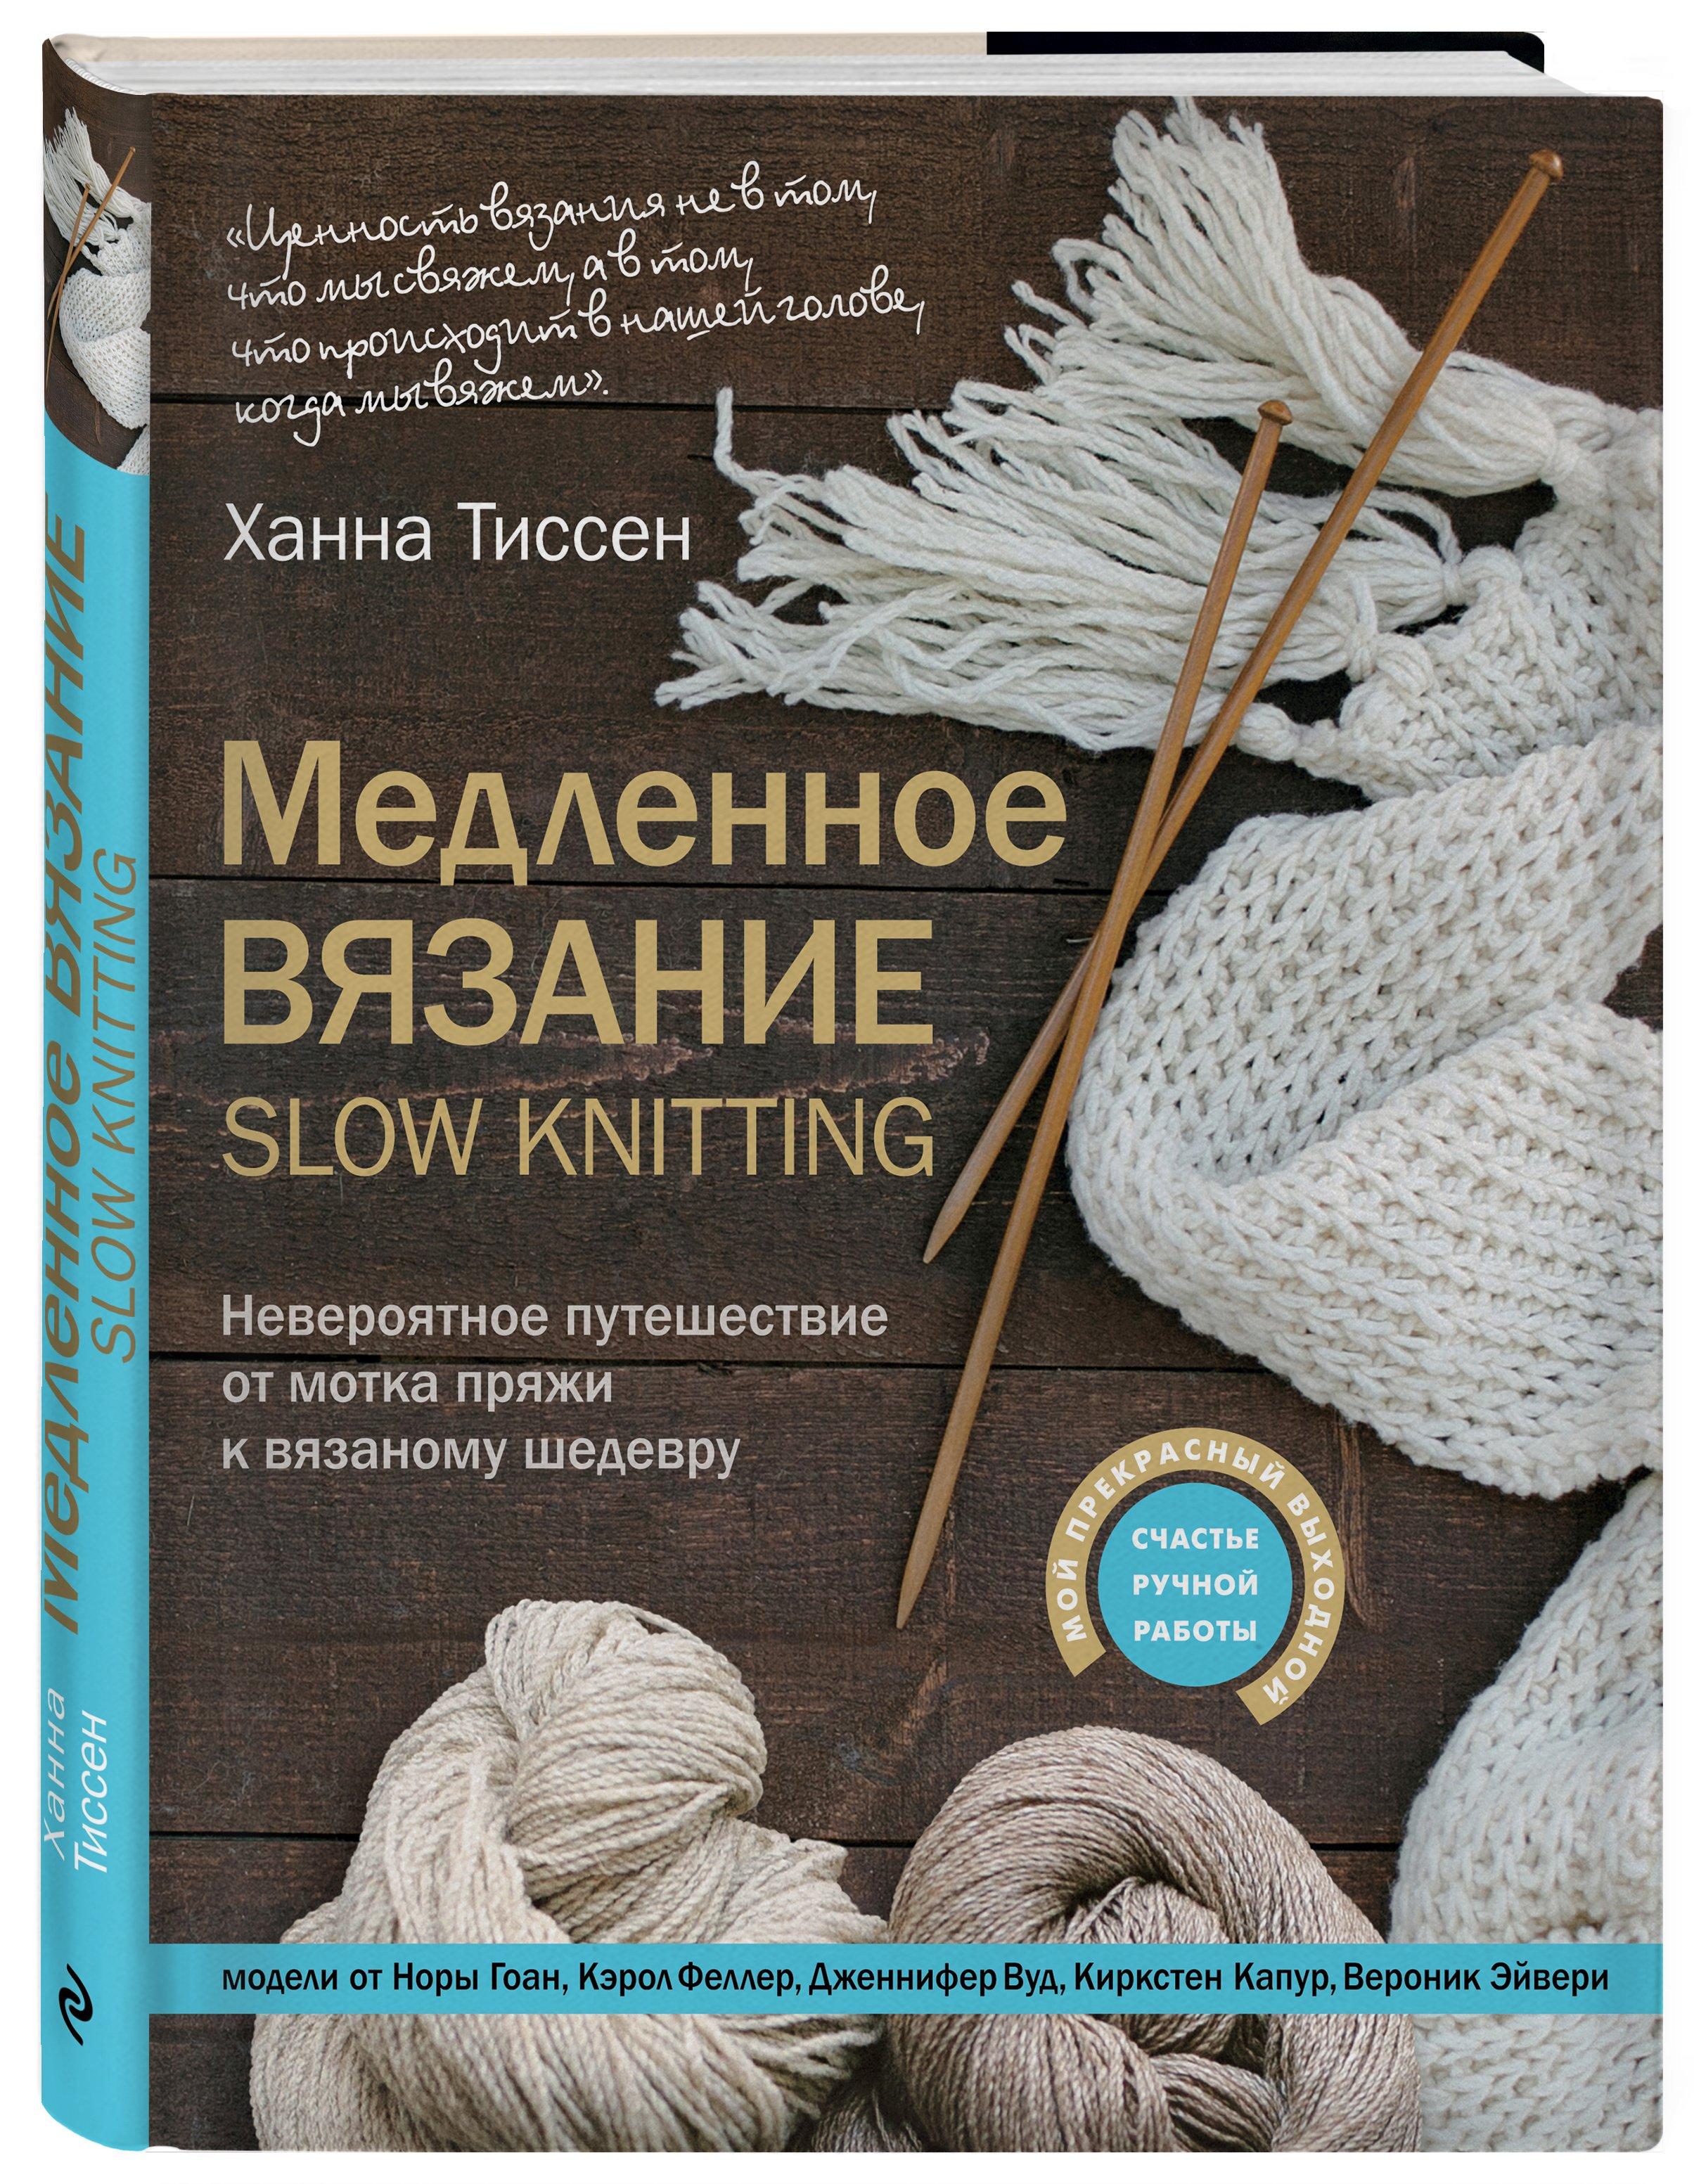 Тиссен Ханна Медленное вязание - SLOW KNITTING. Невероятное путешествие от мотка пряжи к вязаному шедевру тиссен ханна медленное вязание slow knitting невероятное путешествие от мотка пряжи к вязаному шедевру